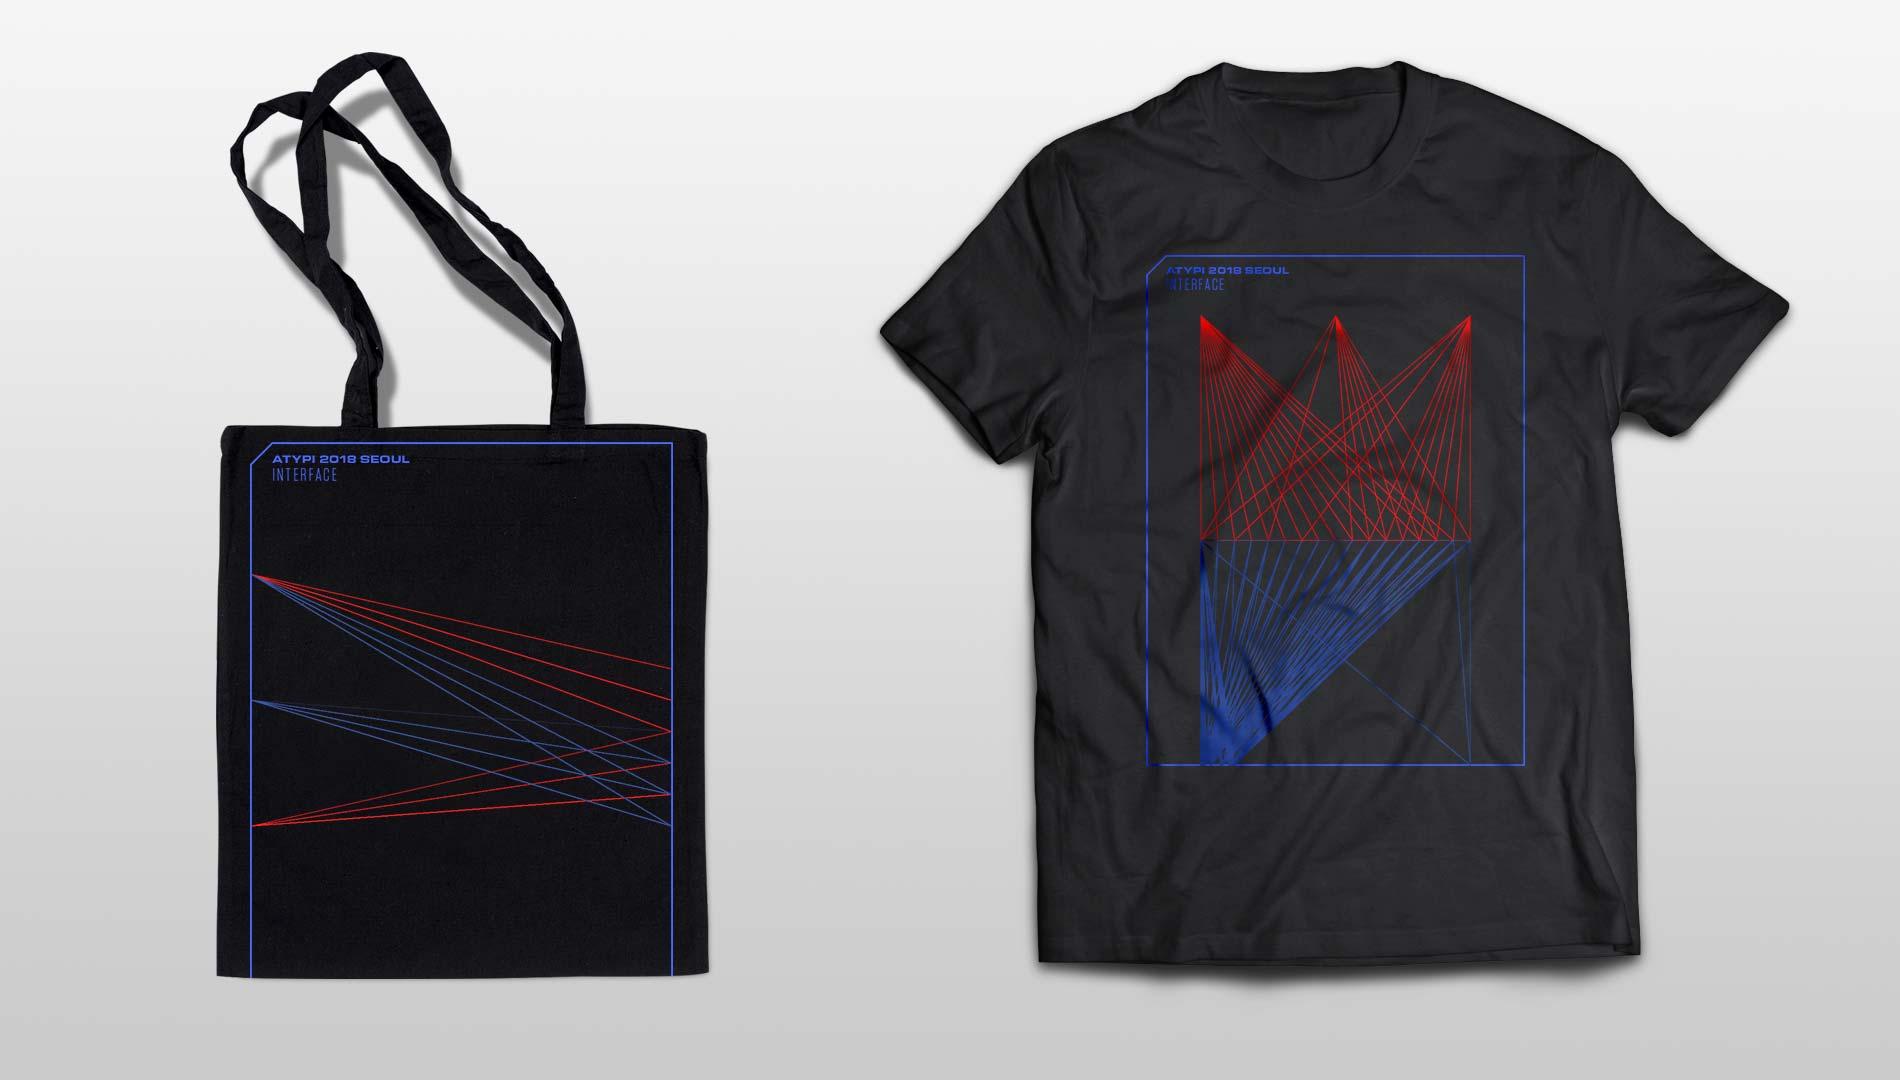 matthan_evans_bag-tshirt_2